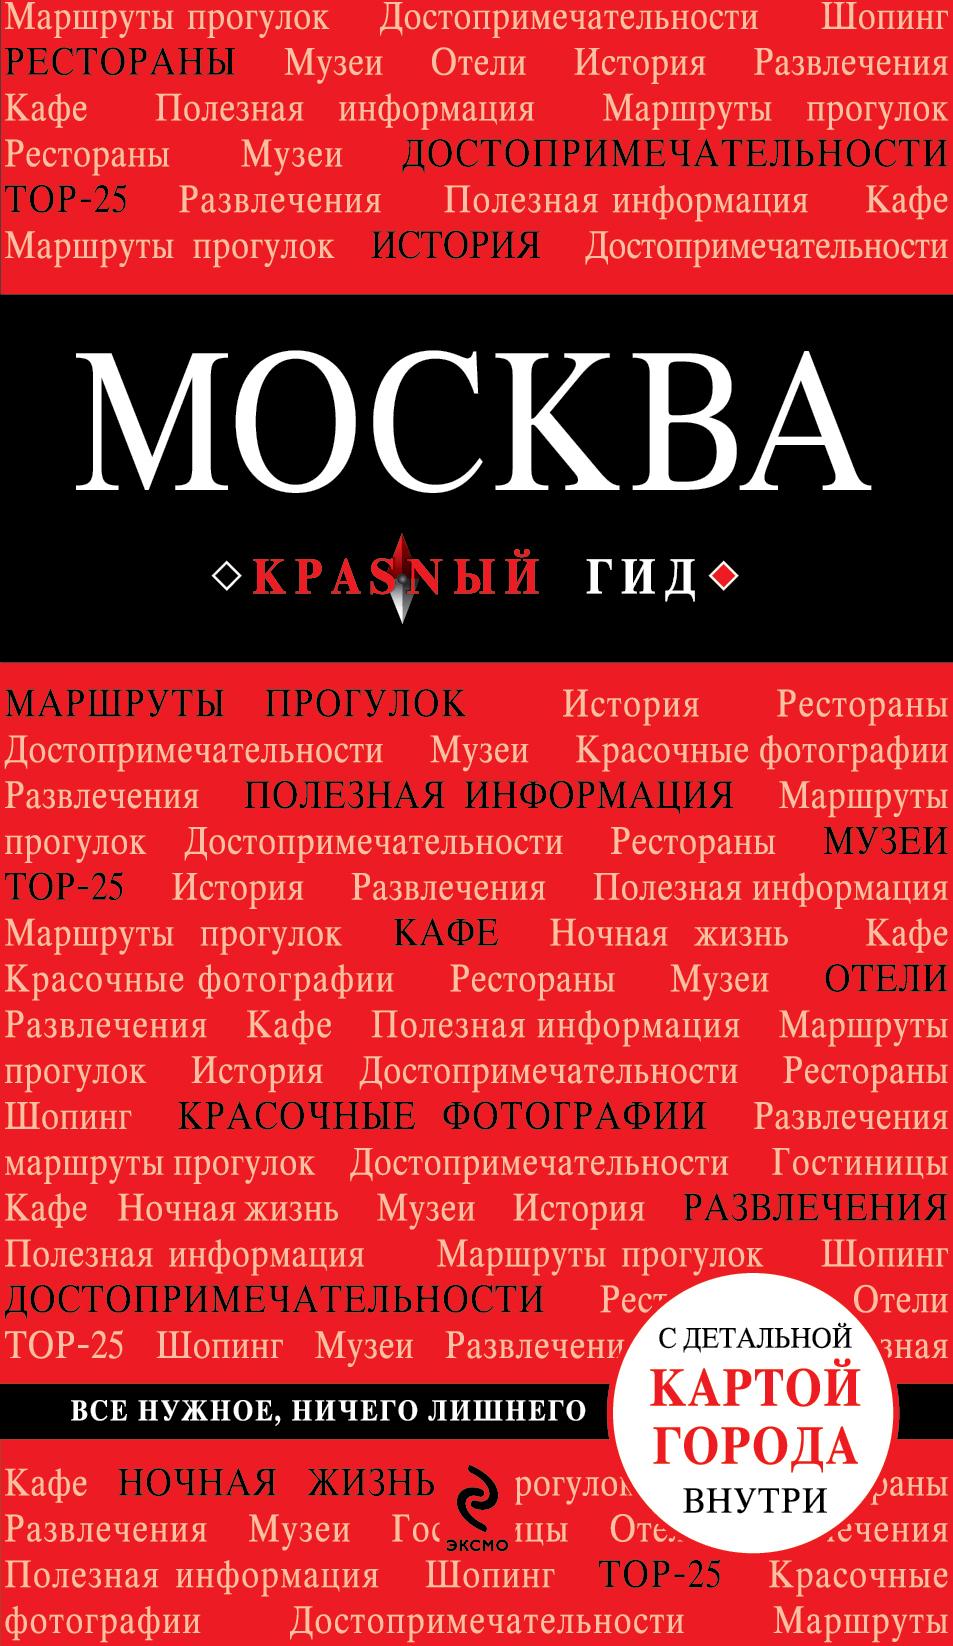 Москва. 2-е изд., испр. и доп.